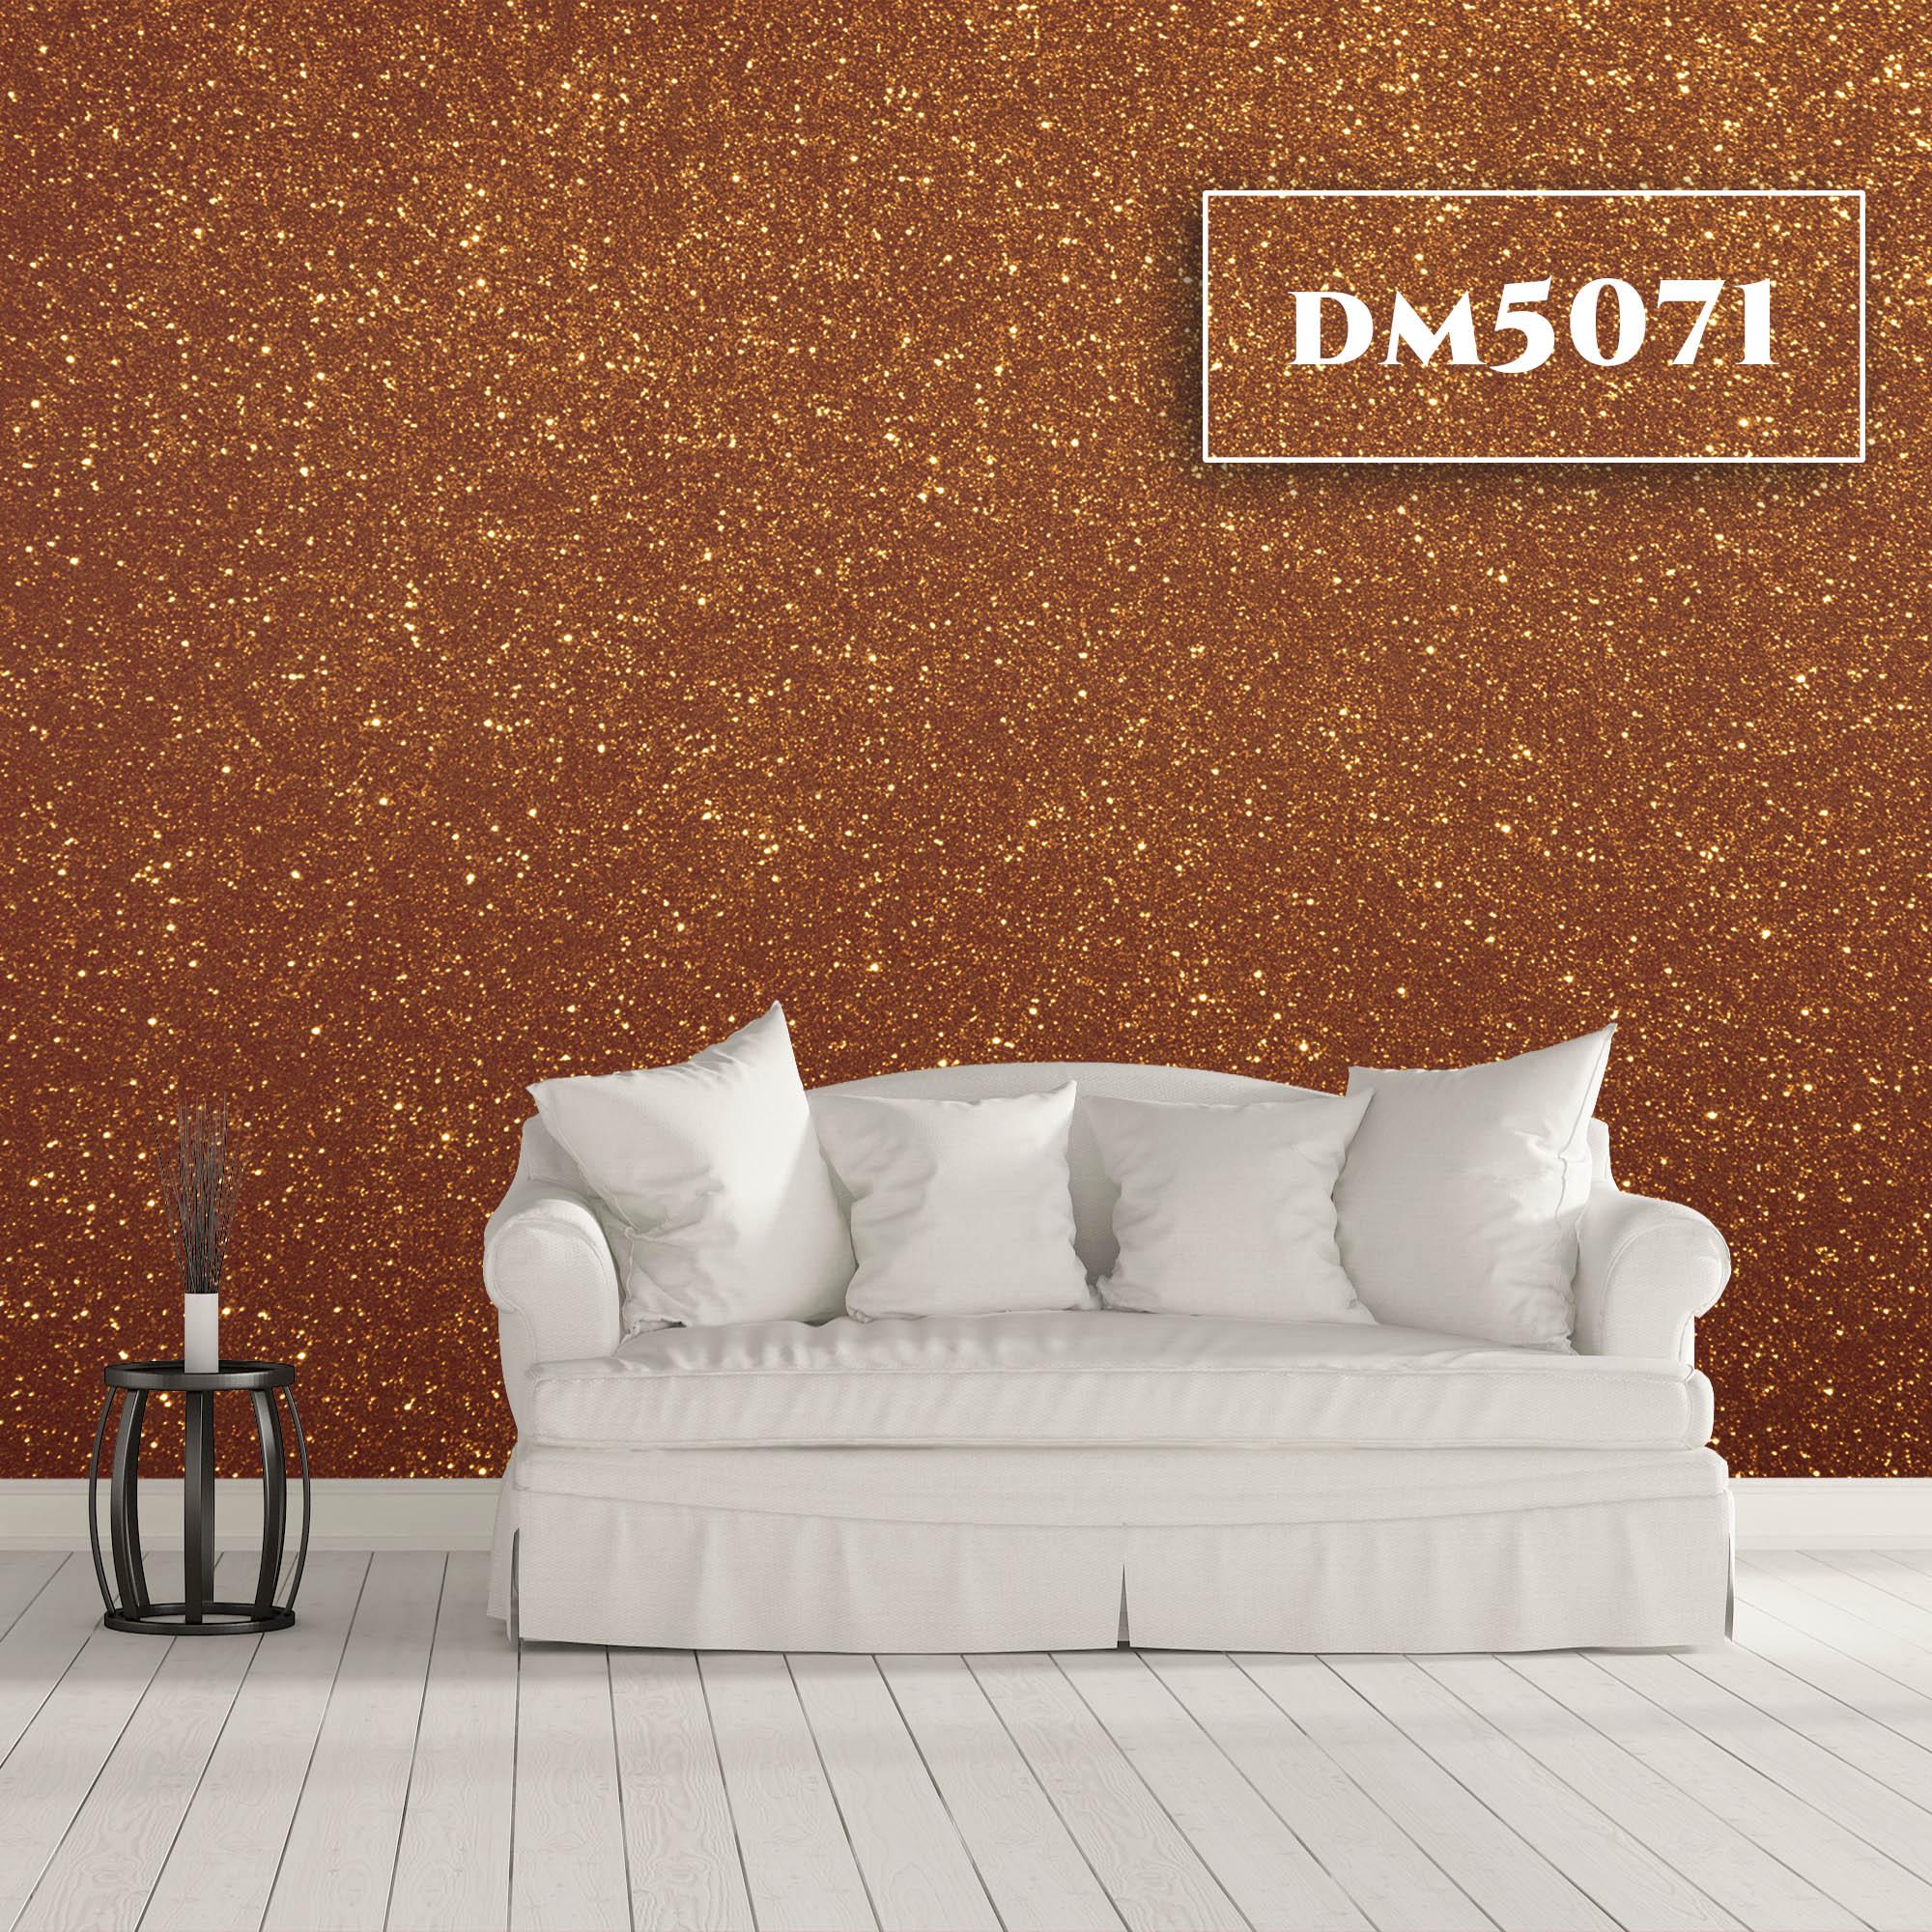 DM5071